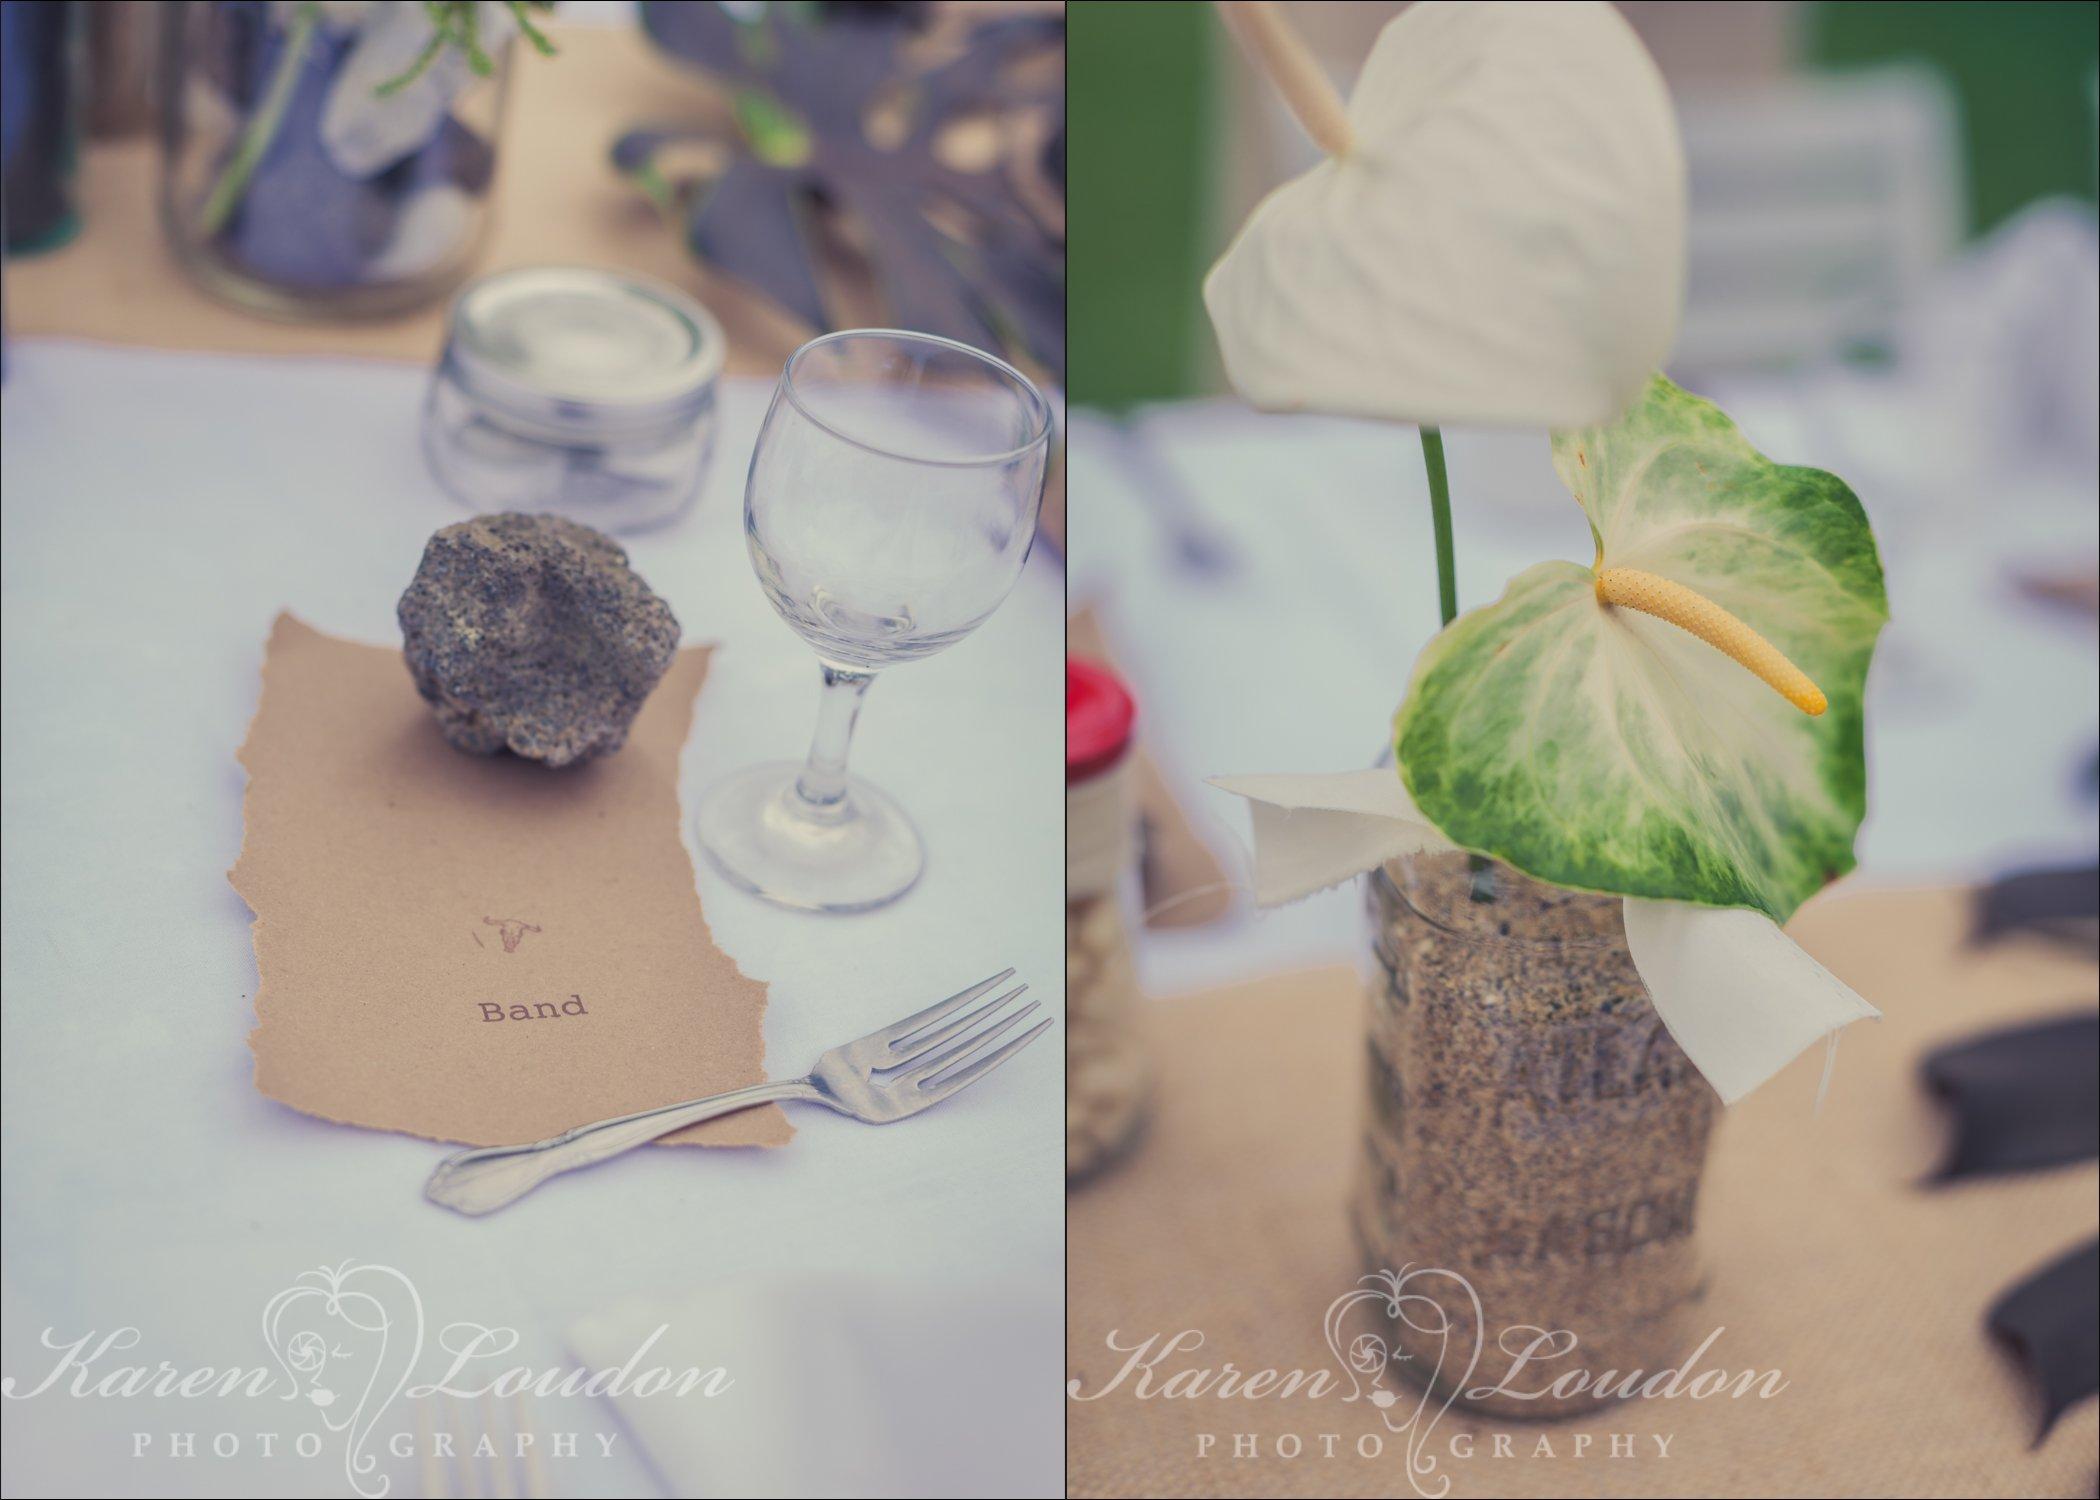 King kamehamaha Hotel wedding reception © Karen Loudon Photography-0093